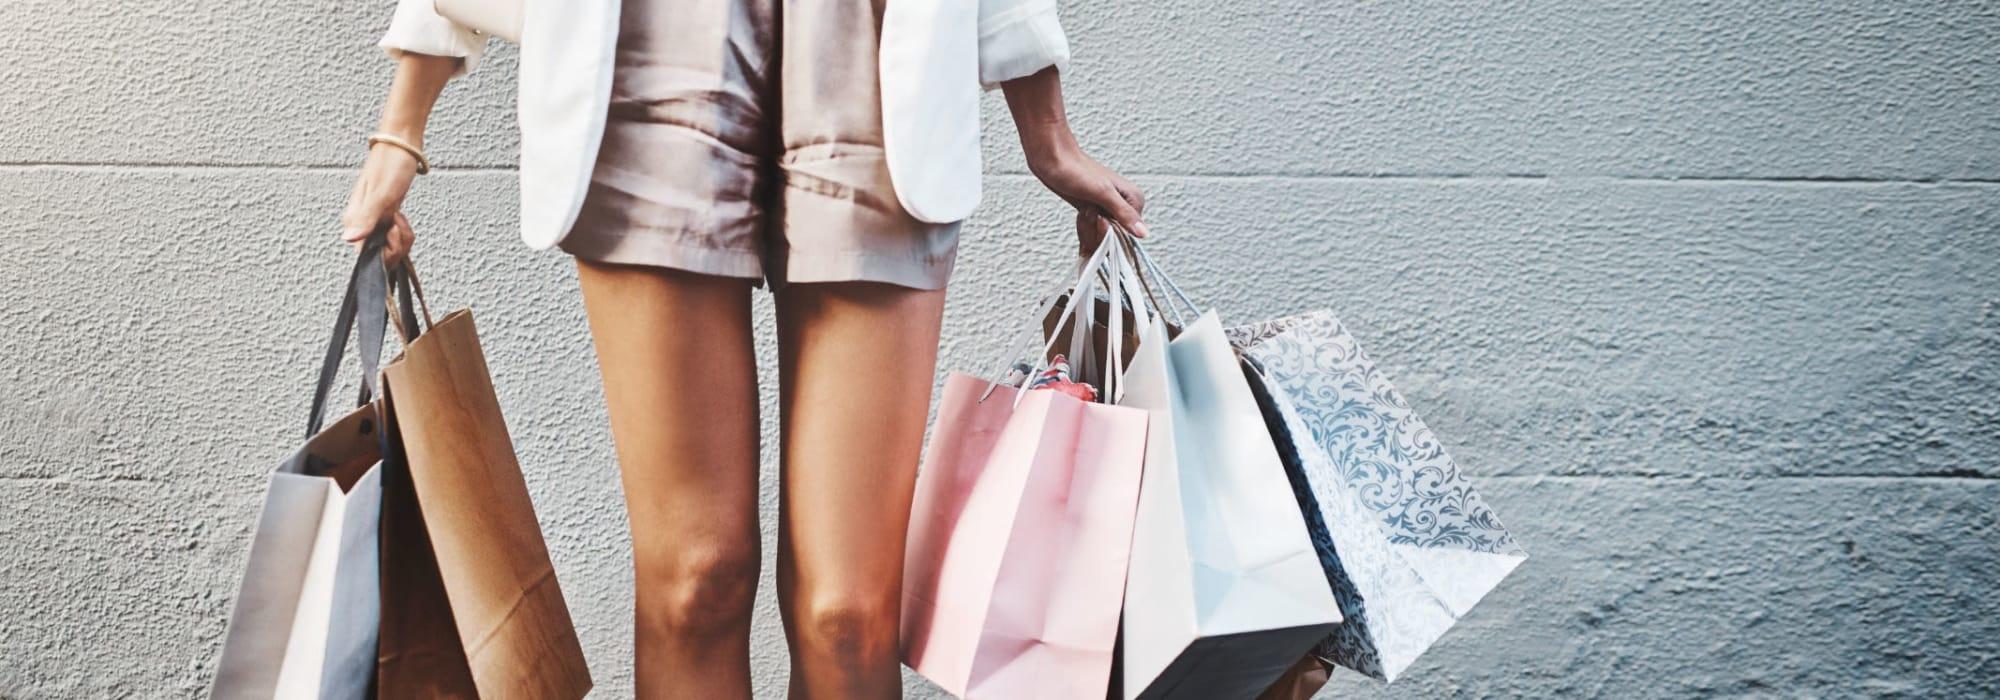 Resident shopping near San Artes in Scottsdale, Arizona